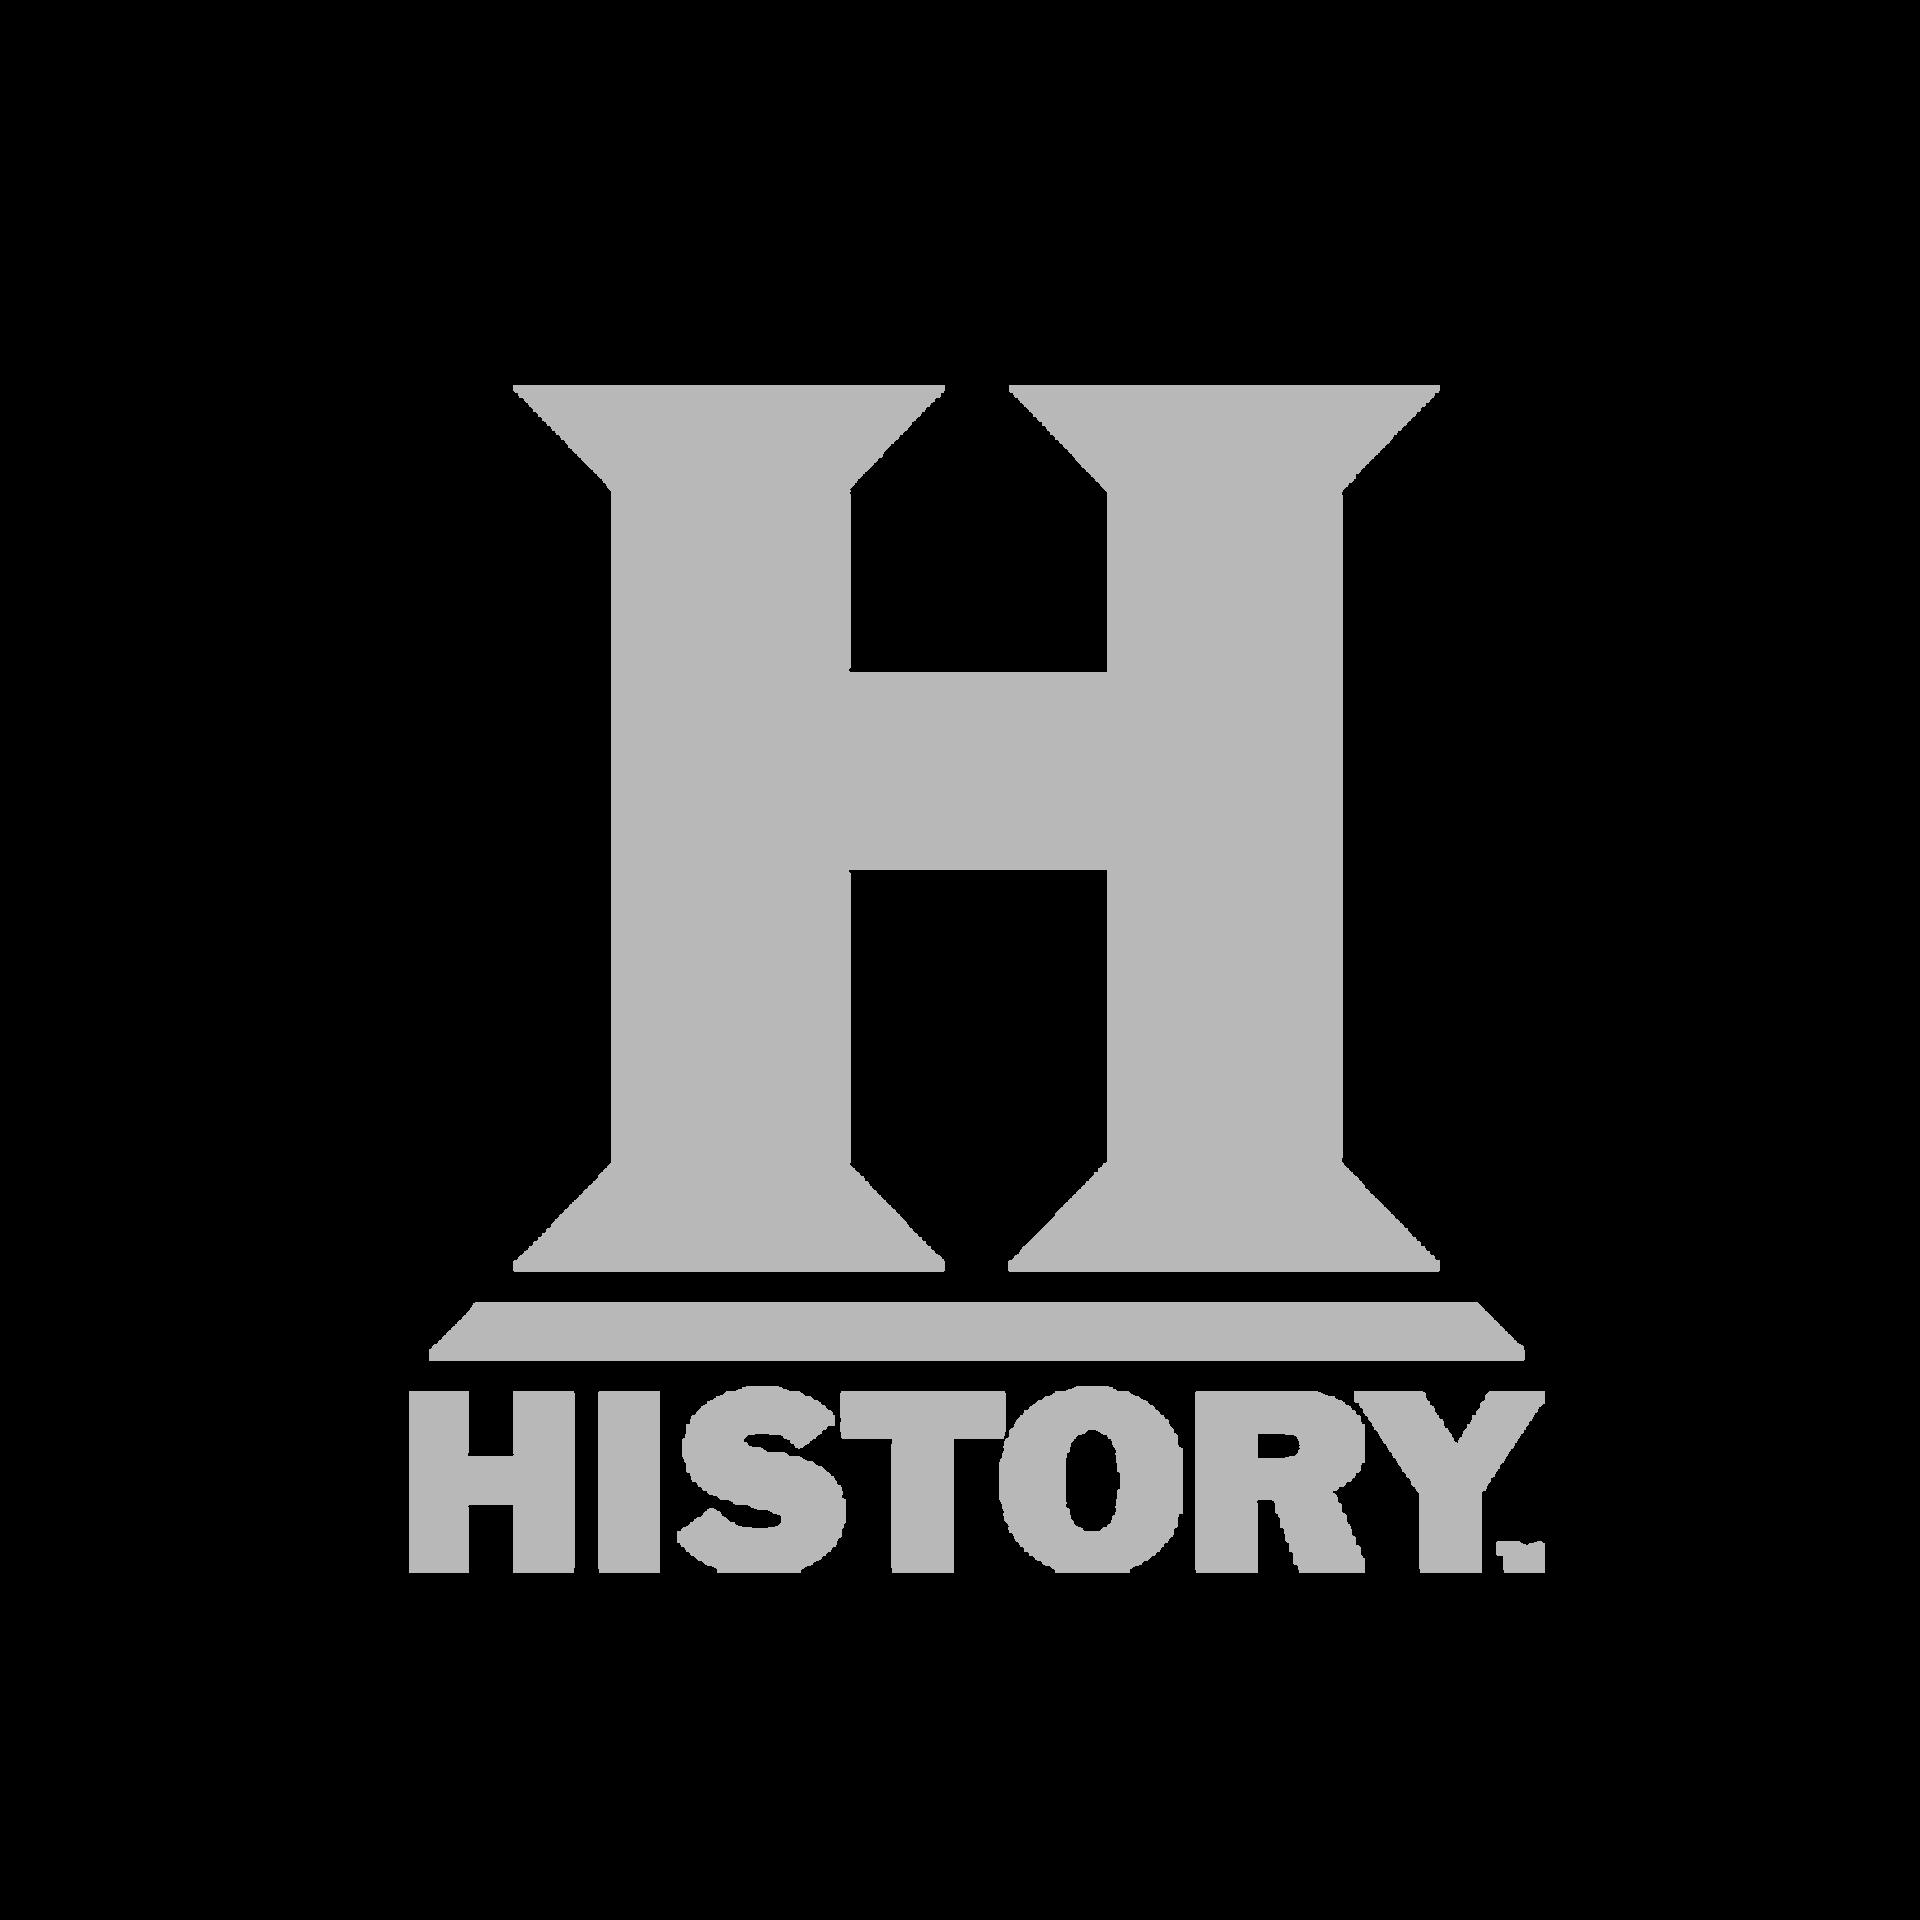 History Transfer